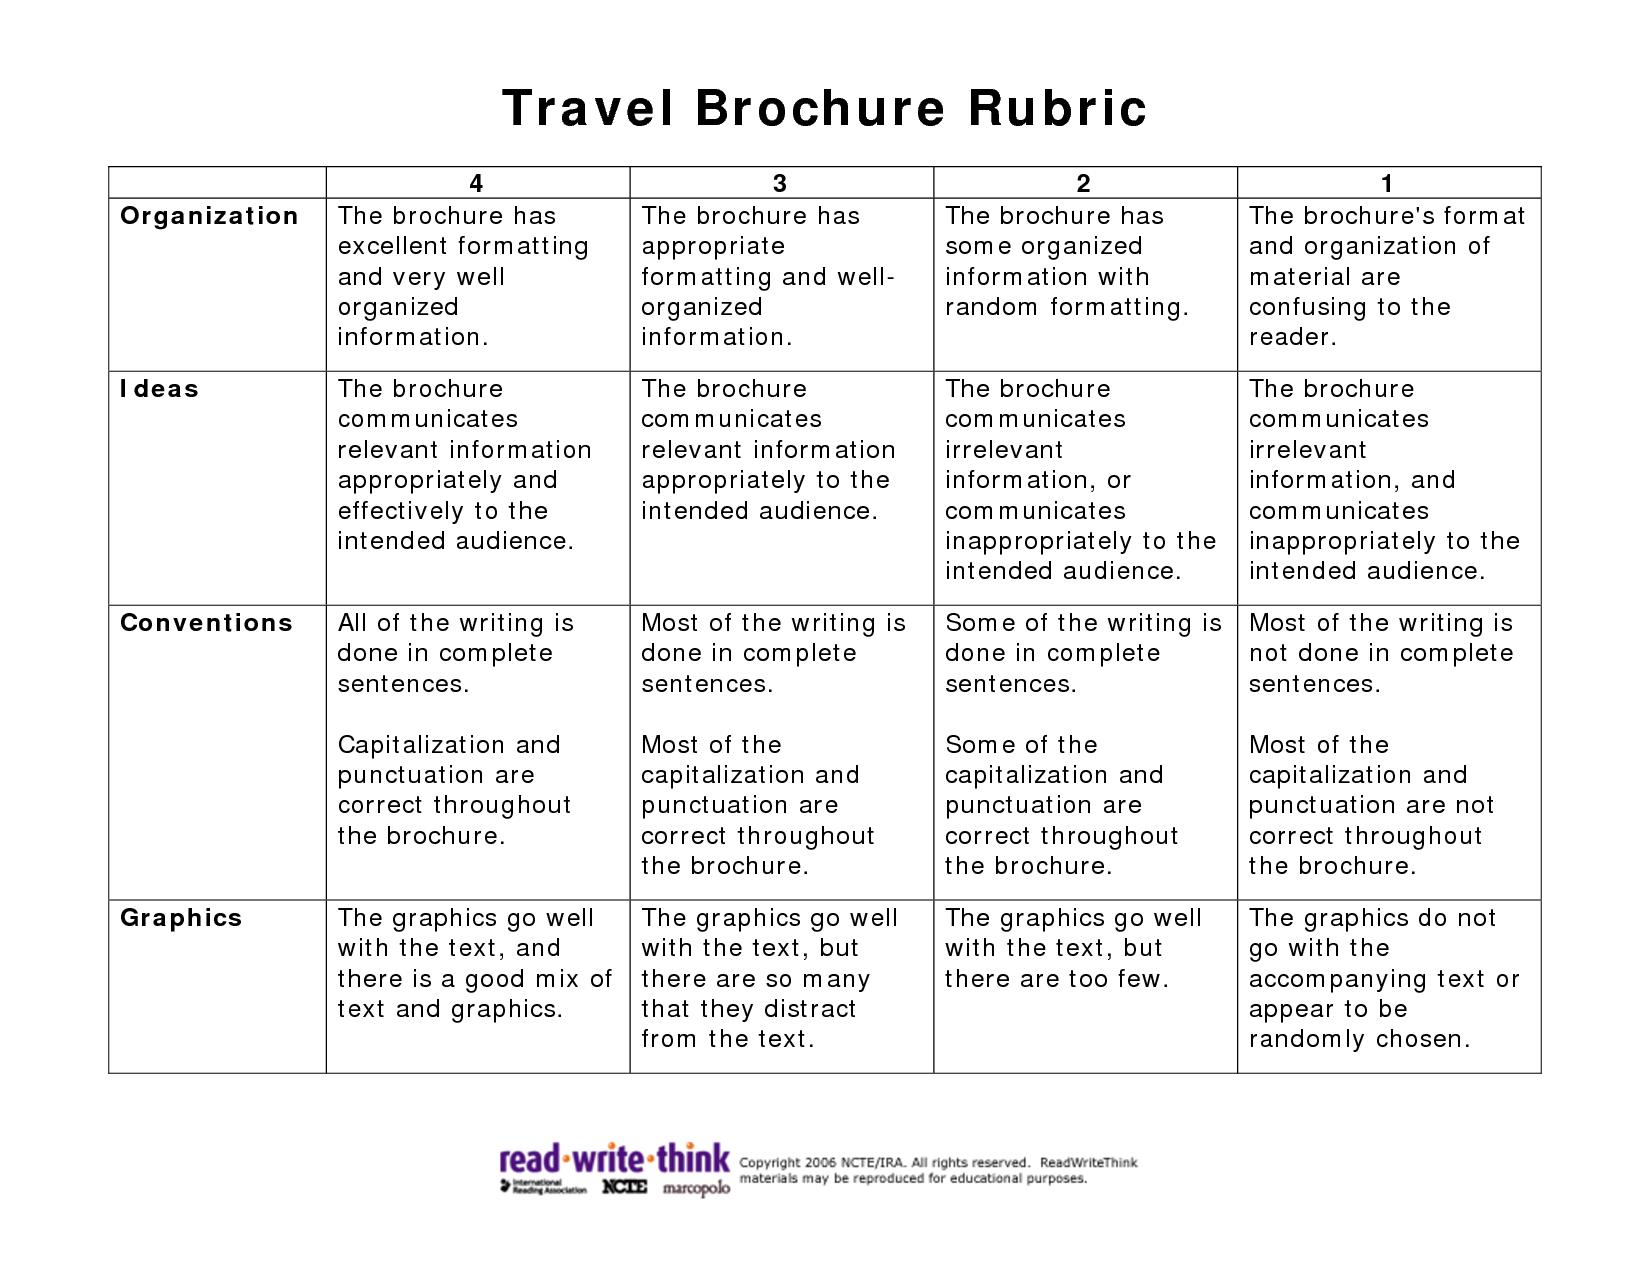 Travel Brochure Rubric | Social Studies | Rubrics, Social For Brochure Rubric Template